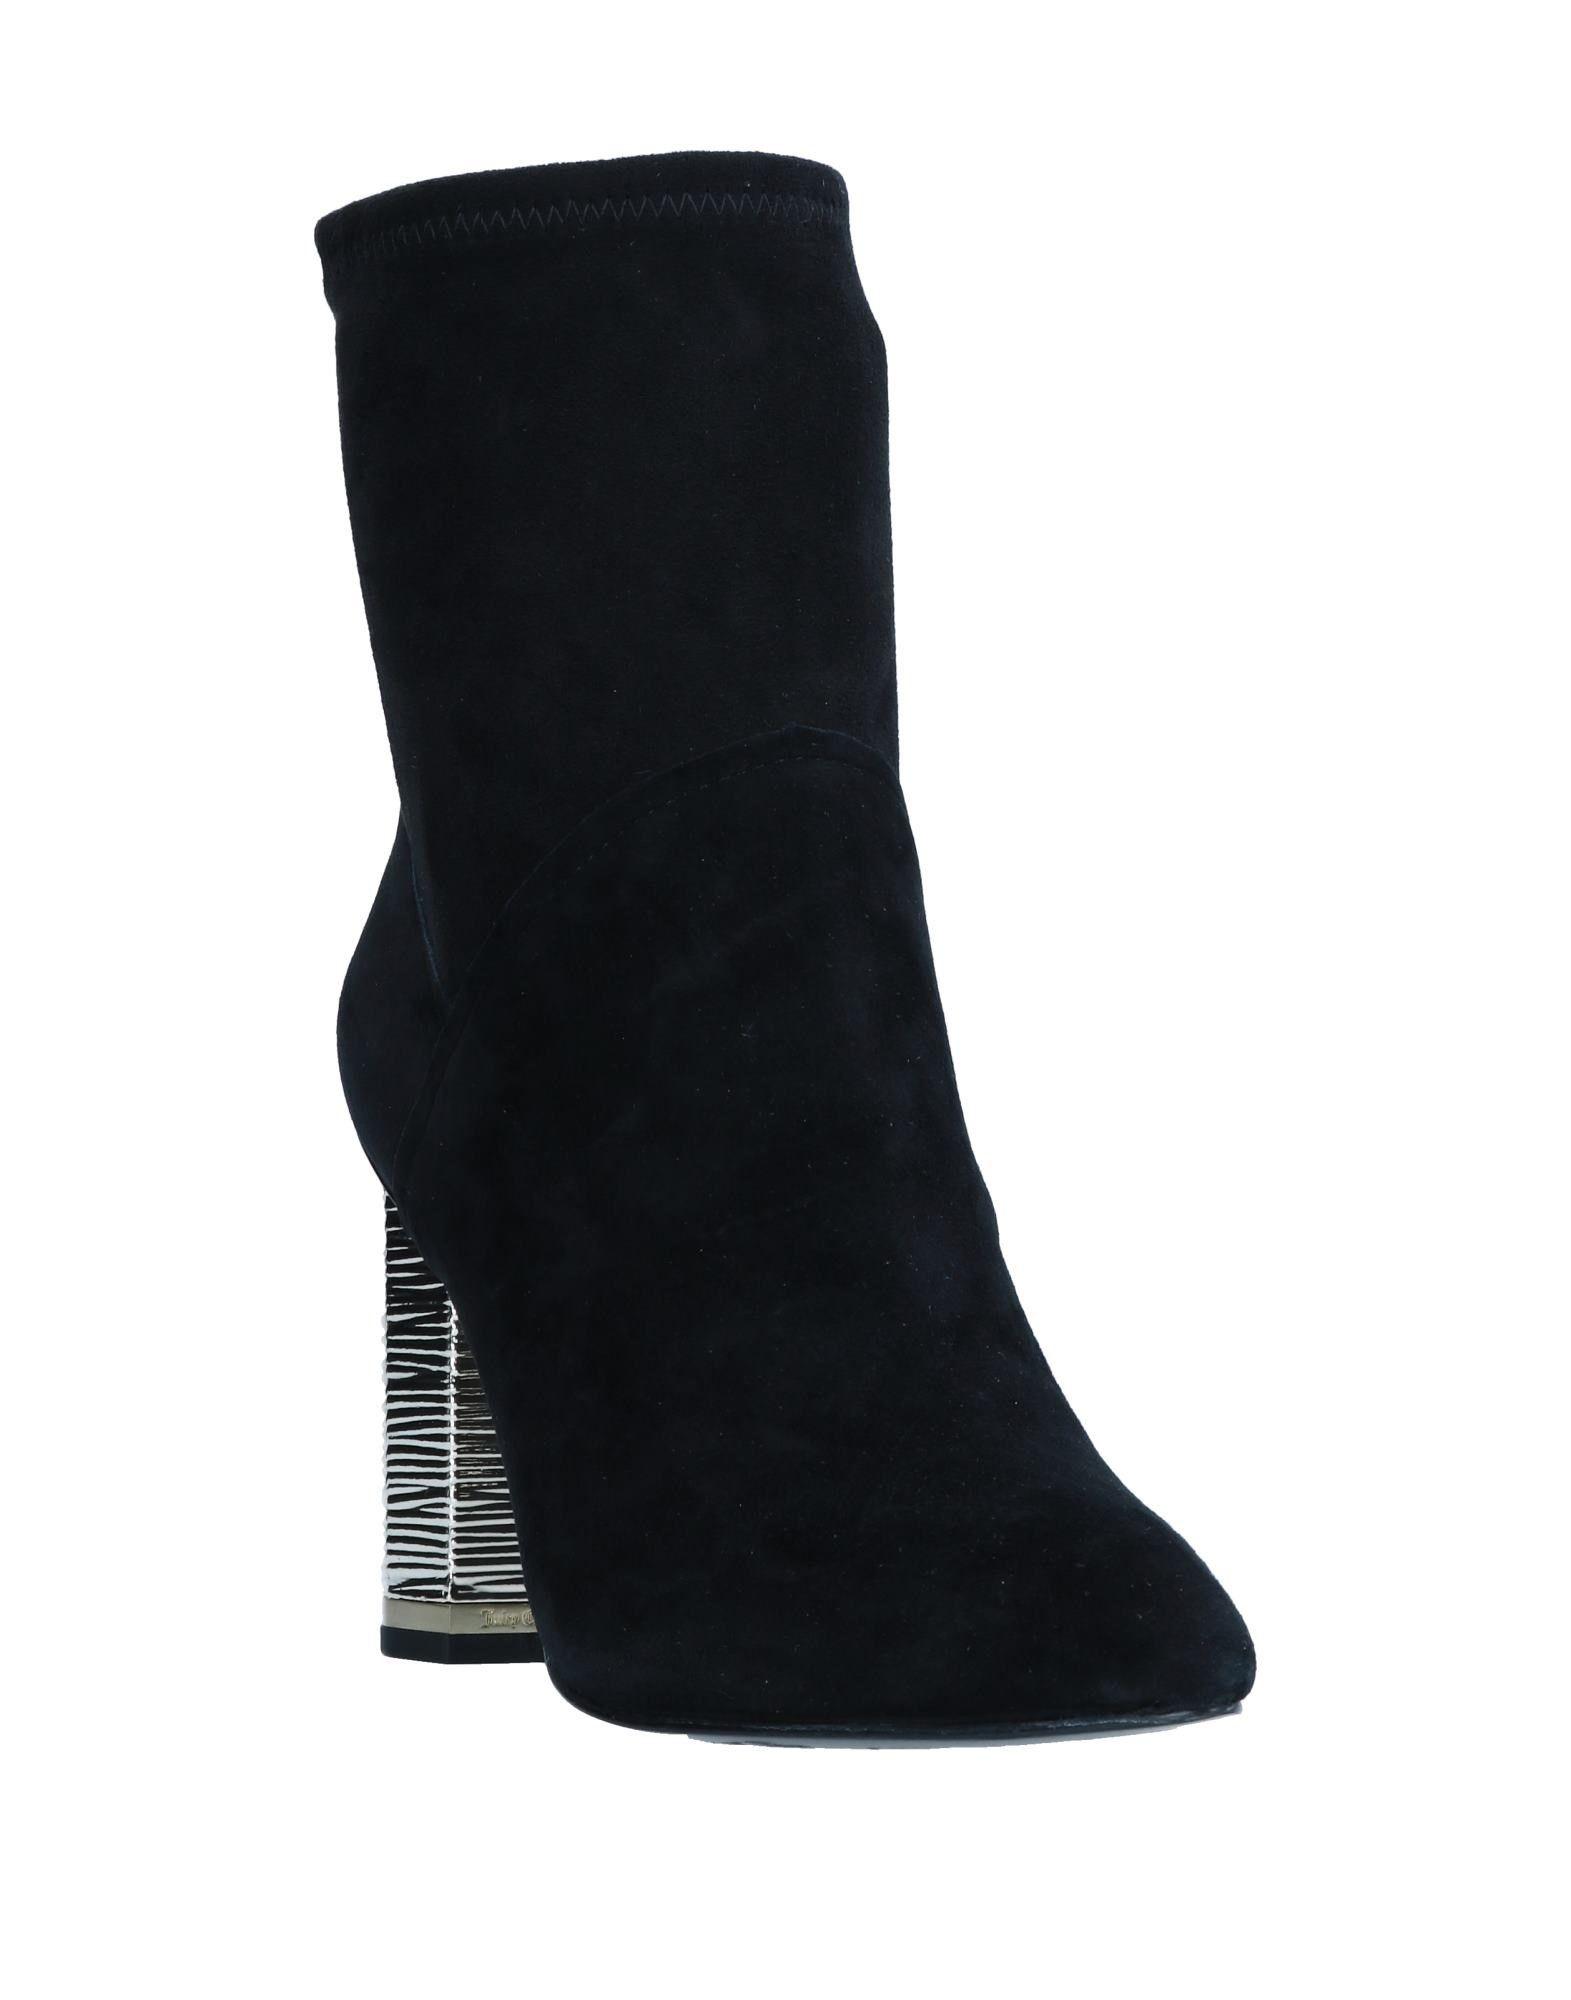 Juicy 11548604BSGut Couture Stiefelette Damen  11548604BSGut Juicy aussehende strapazierfähige Schuhe a239e2